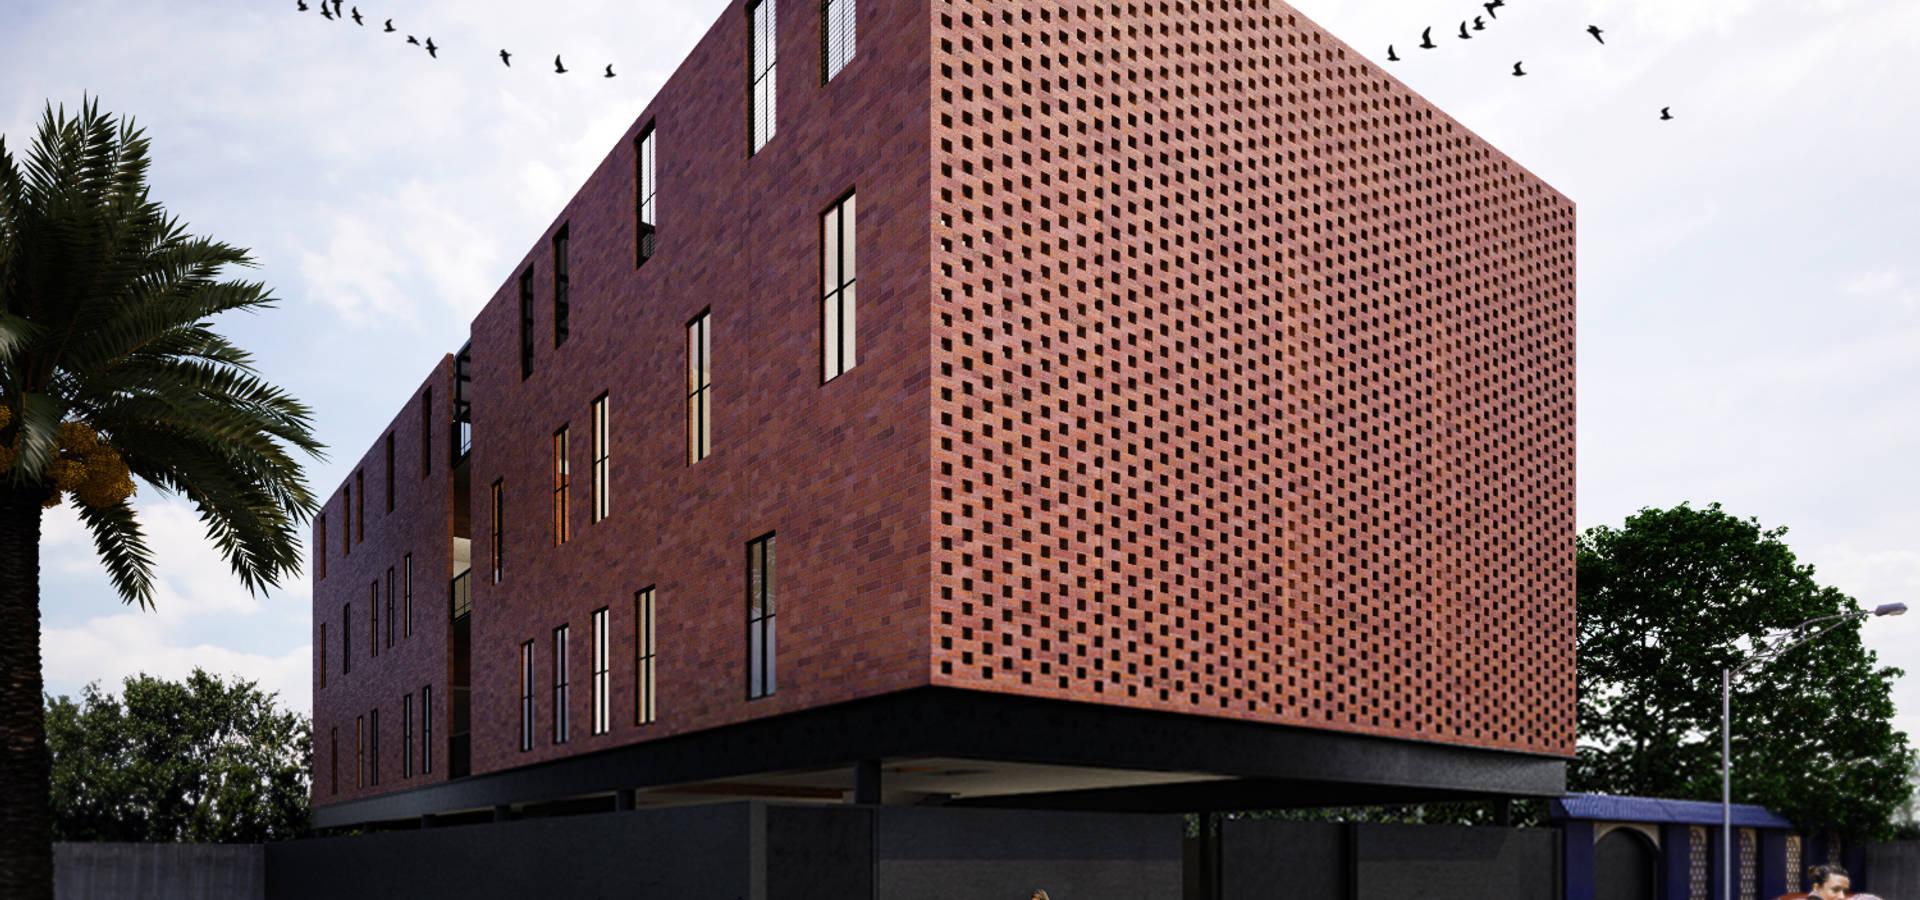 Humberto Leal Arquitecto